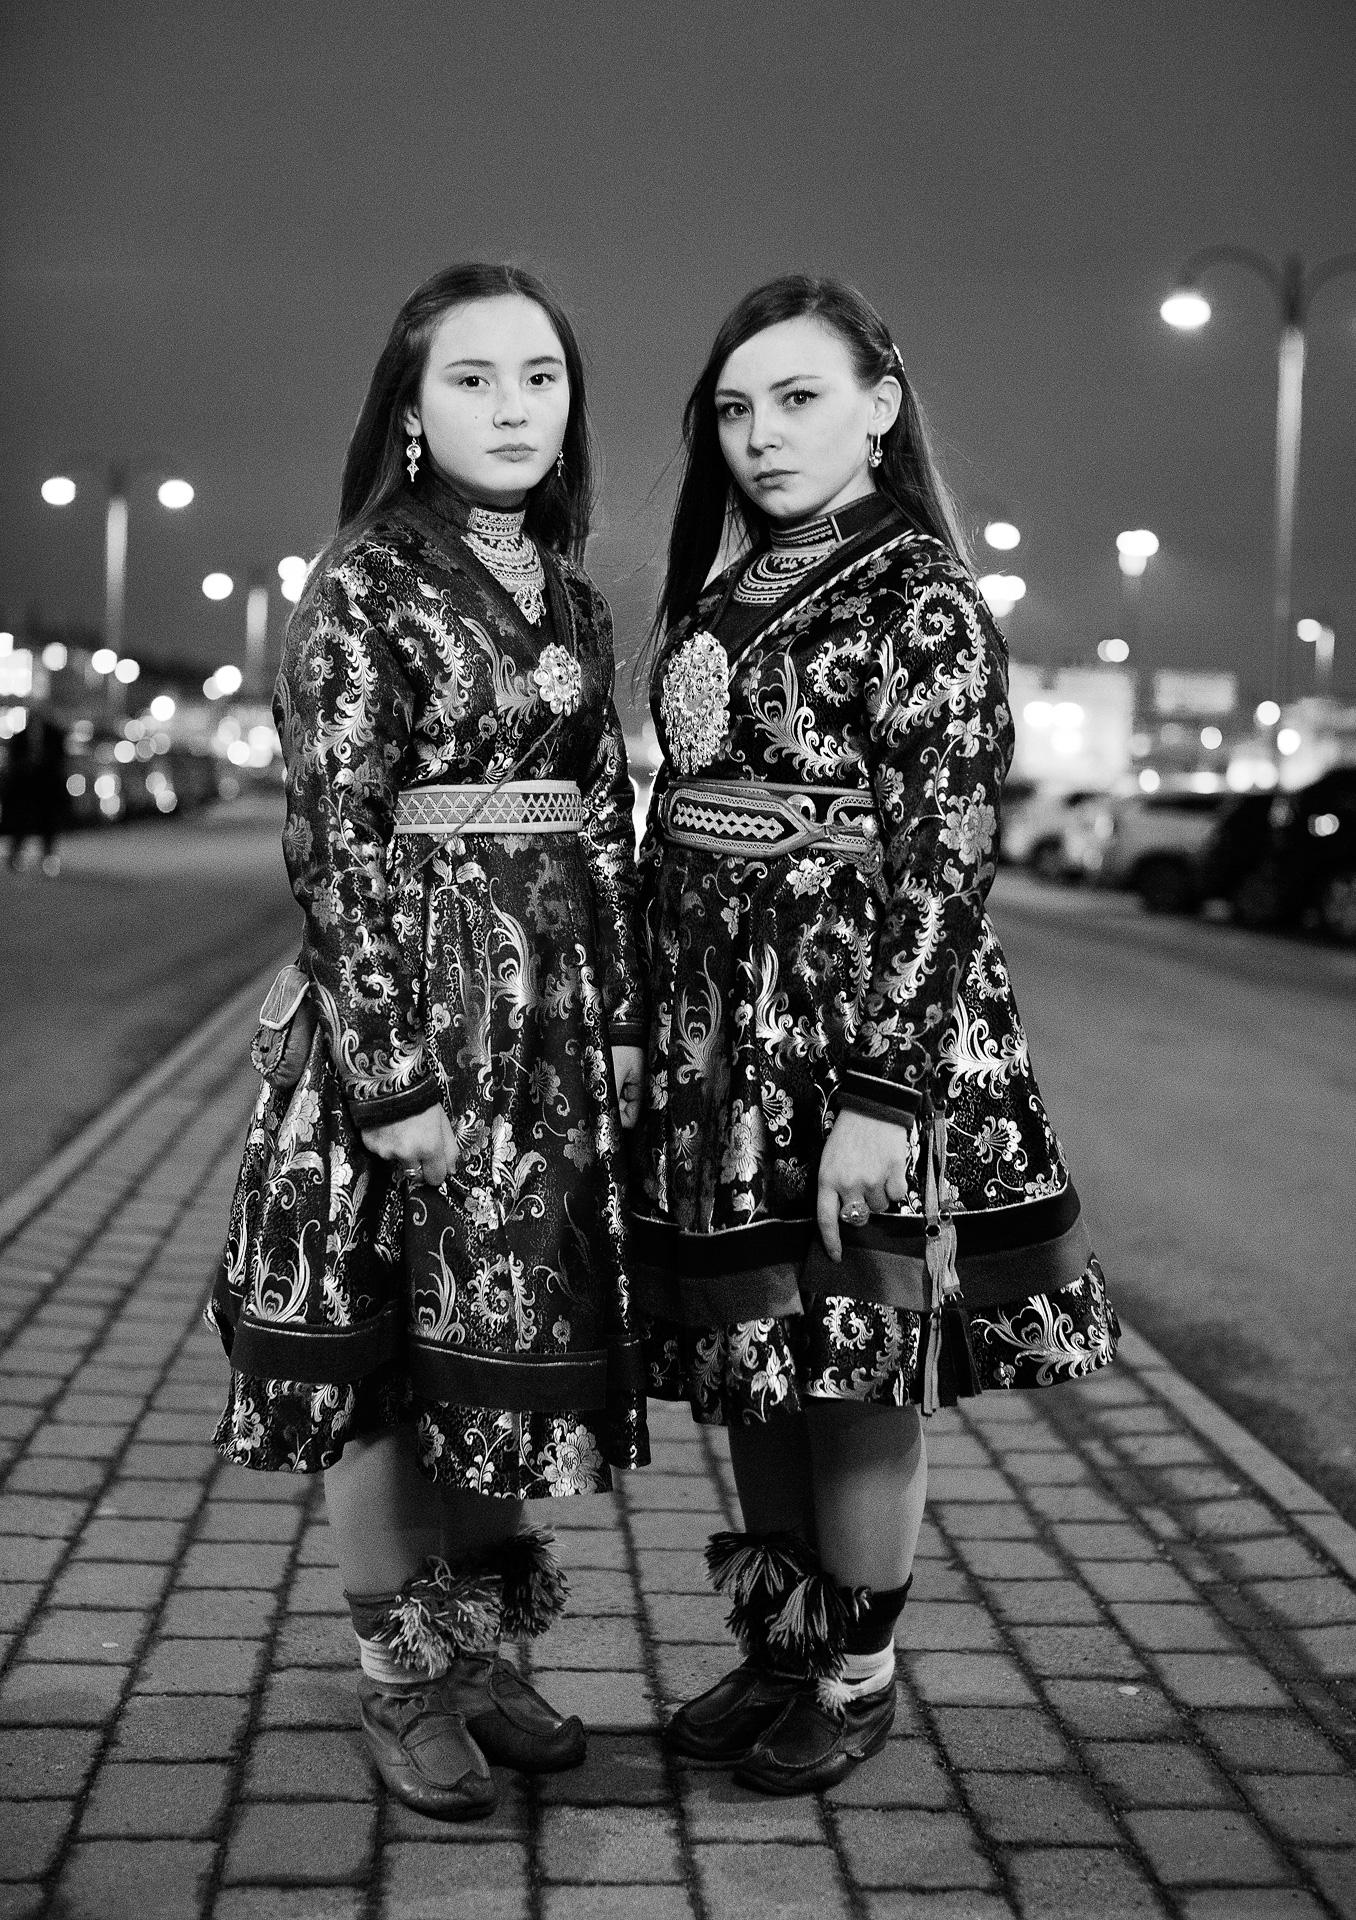 Sameblod, Mia Erika Sparrok & Lene Cecilia Sparrok